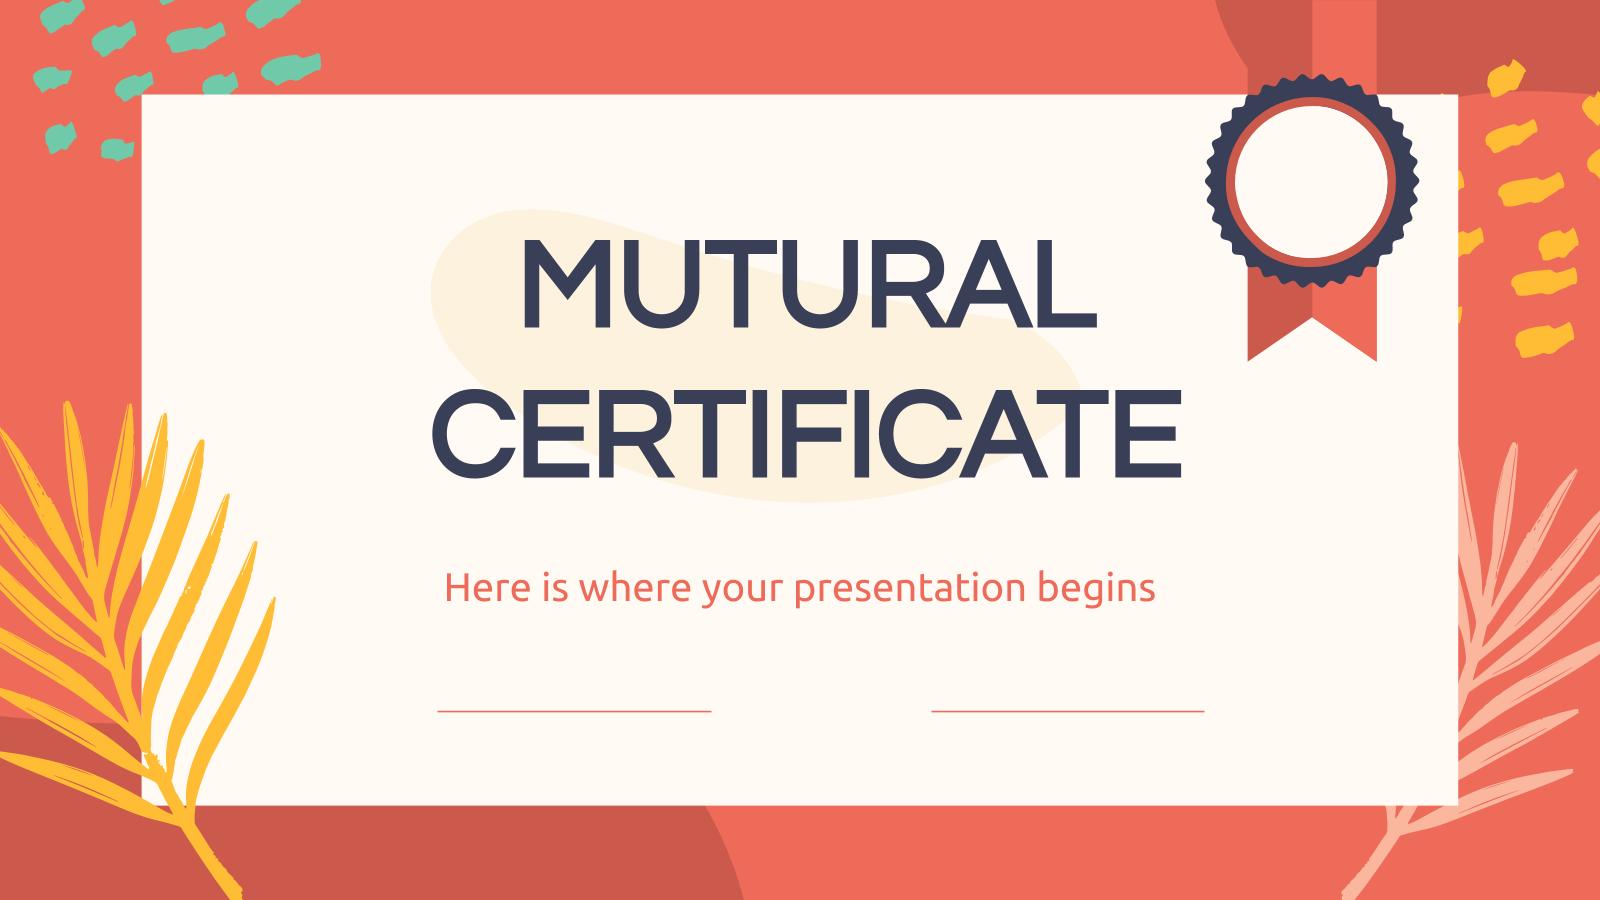 Plantilla de presentación Mutural Zertifikat